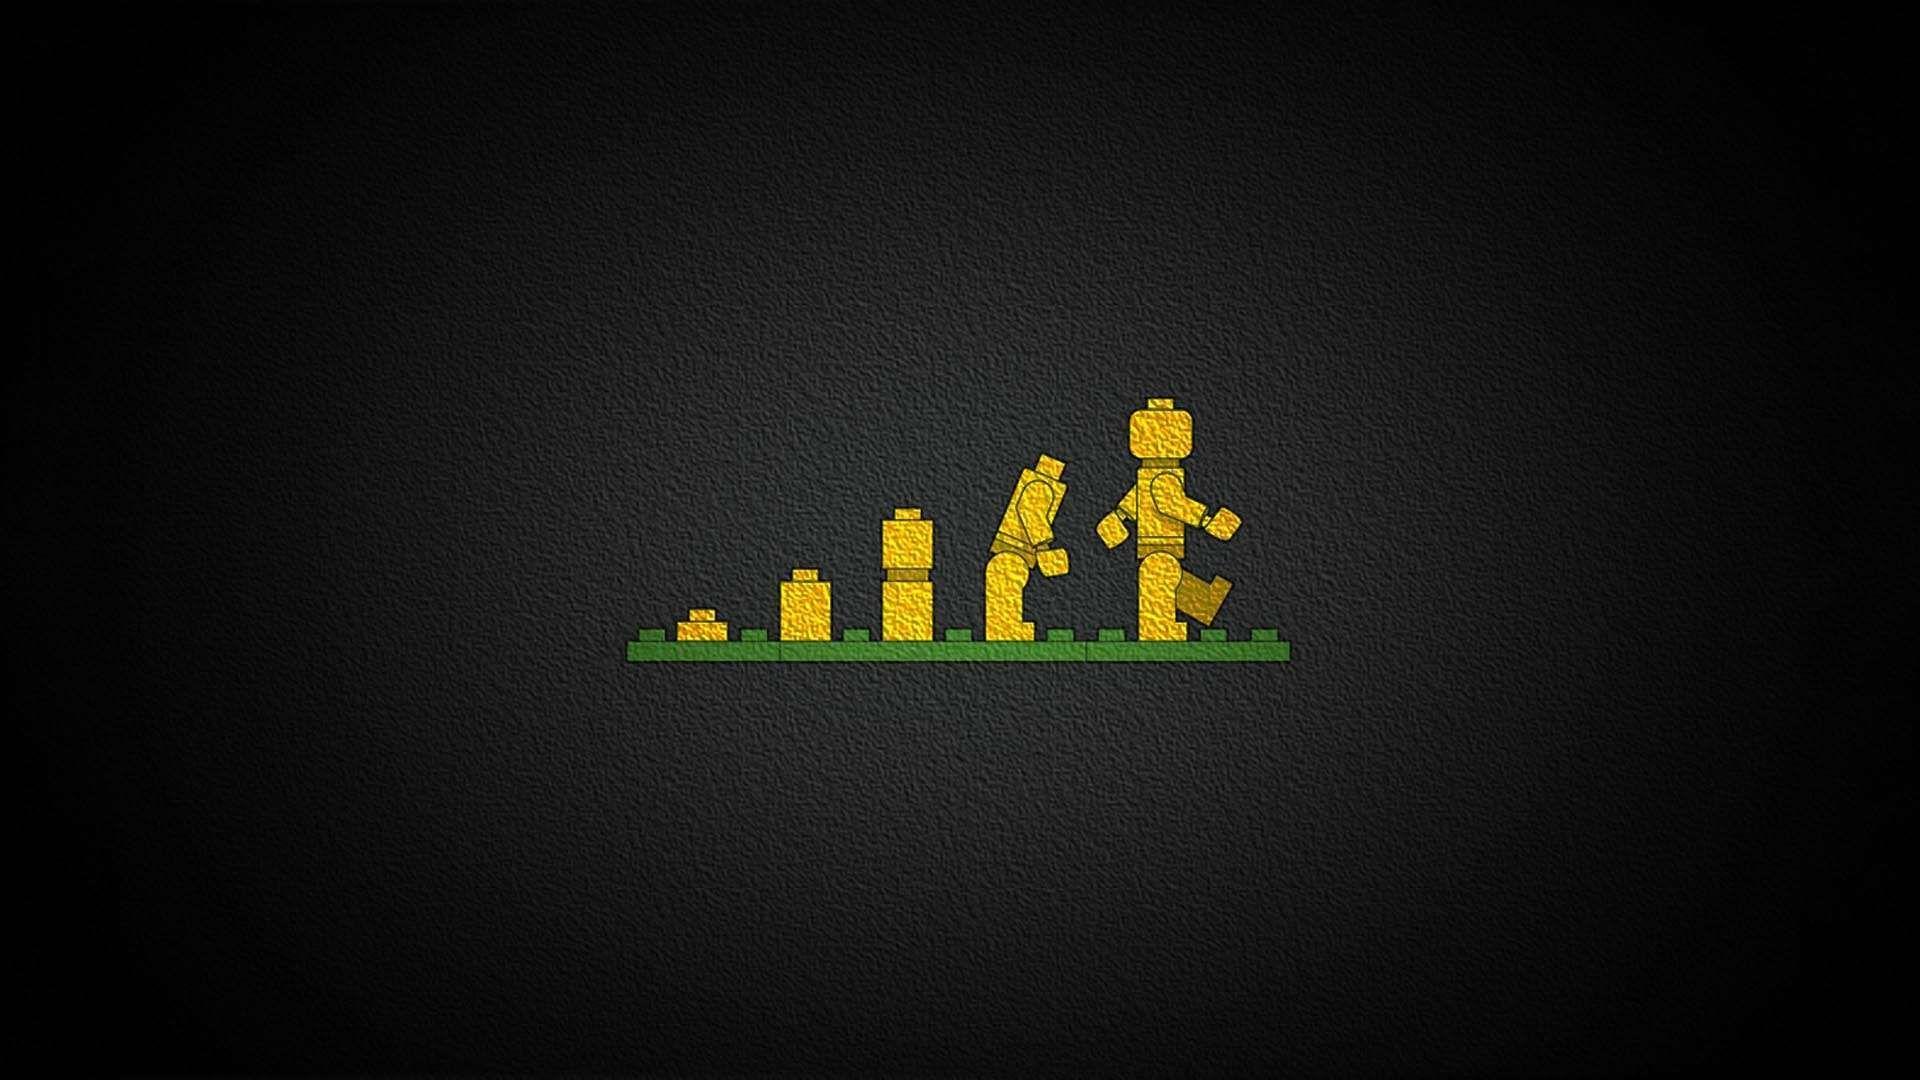 Lego Evolution HD Wallpaper